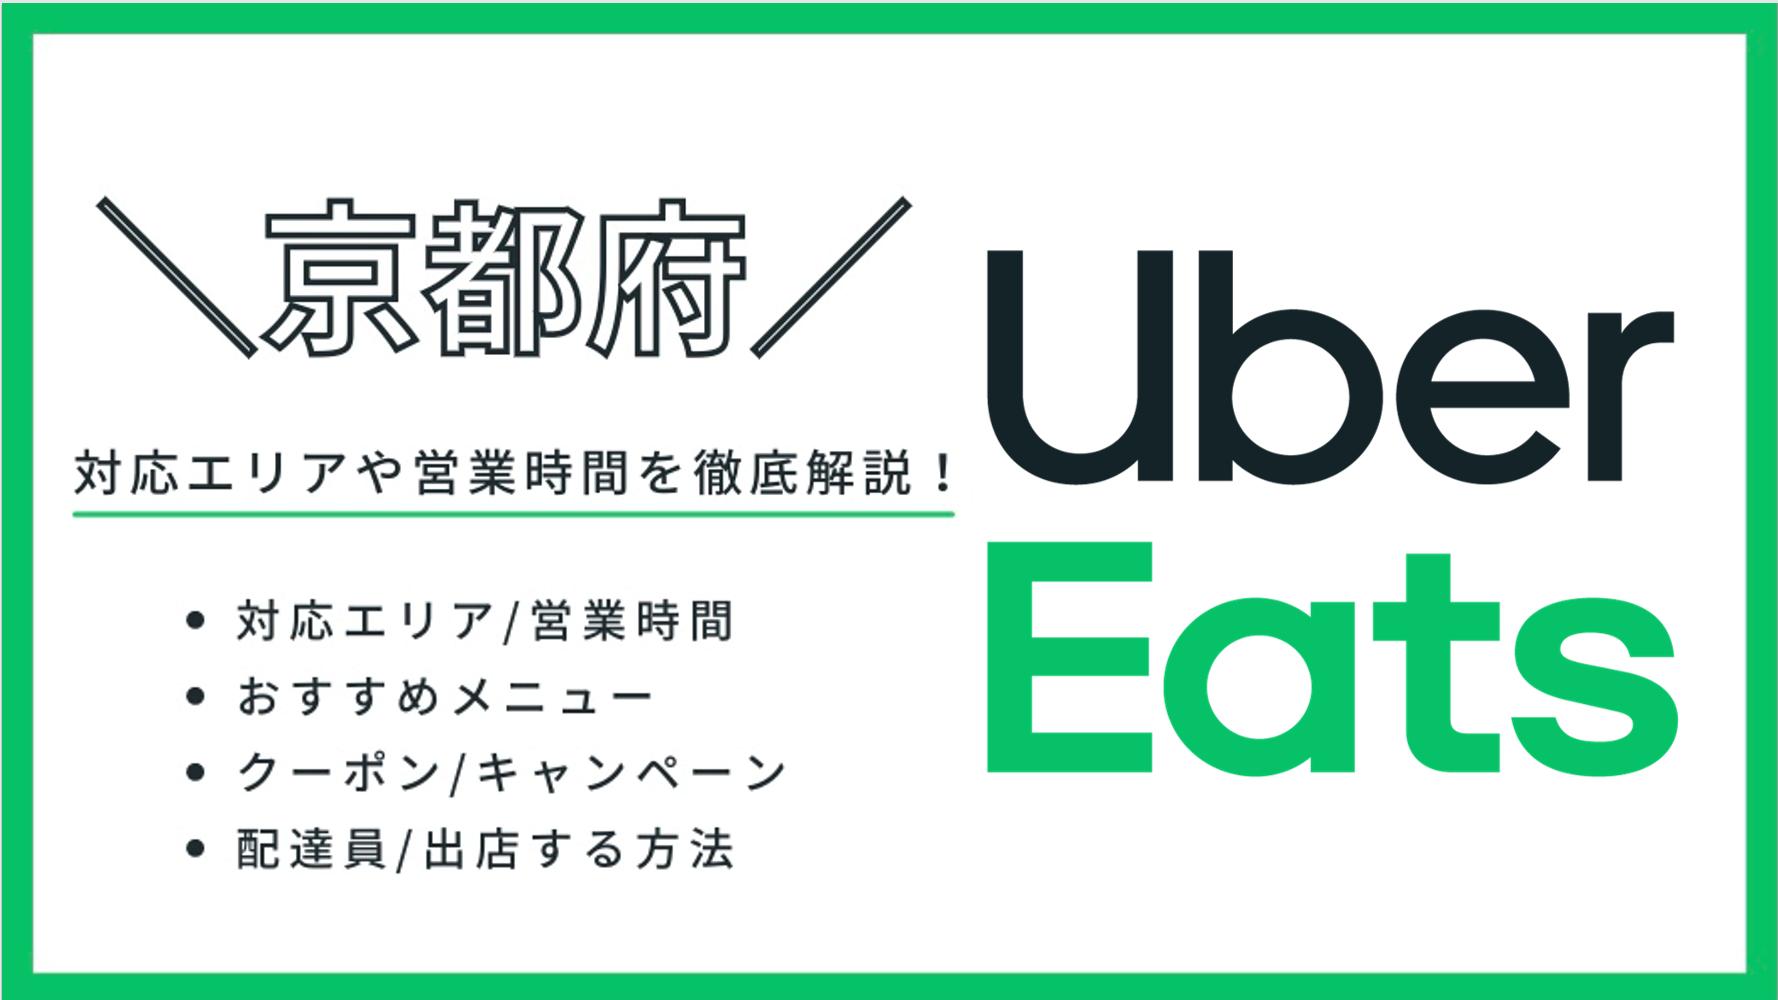 Uber Eats(ウーバーイーツ)京都府の配達エリア・料金・メニュー情報【クーポン・配達パートナー登録も】